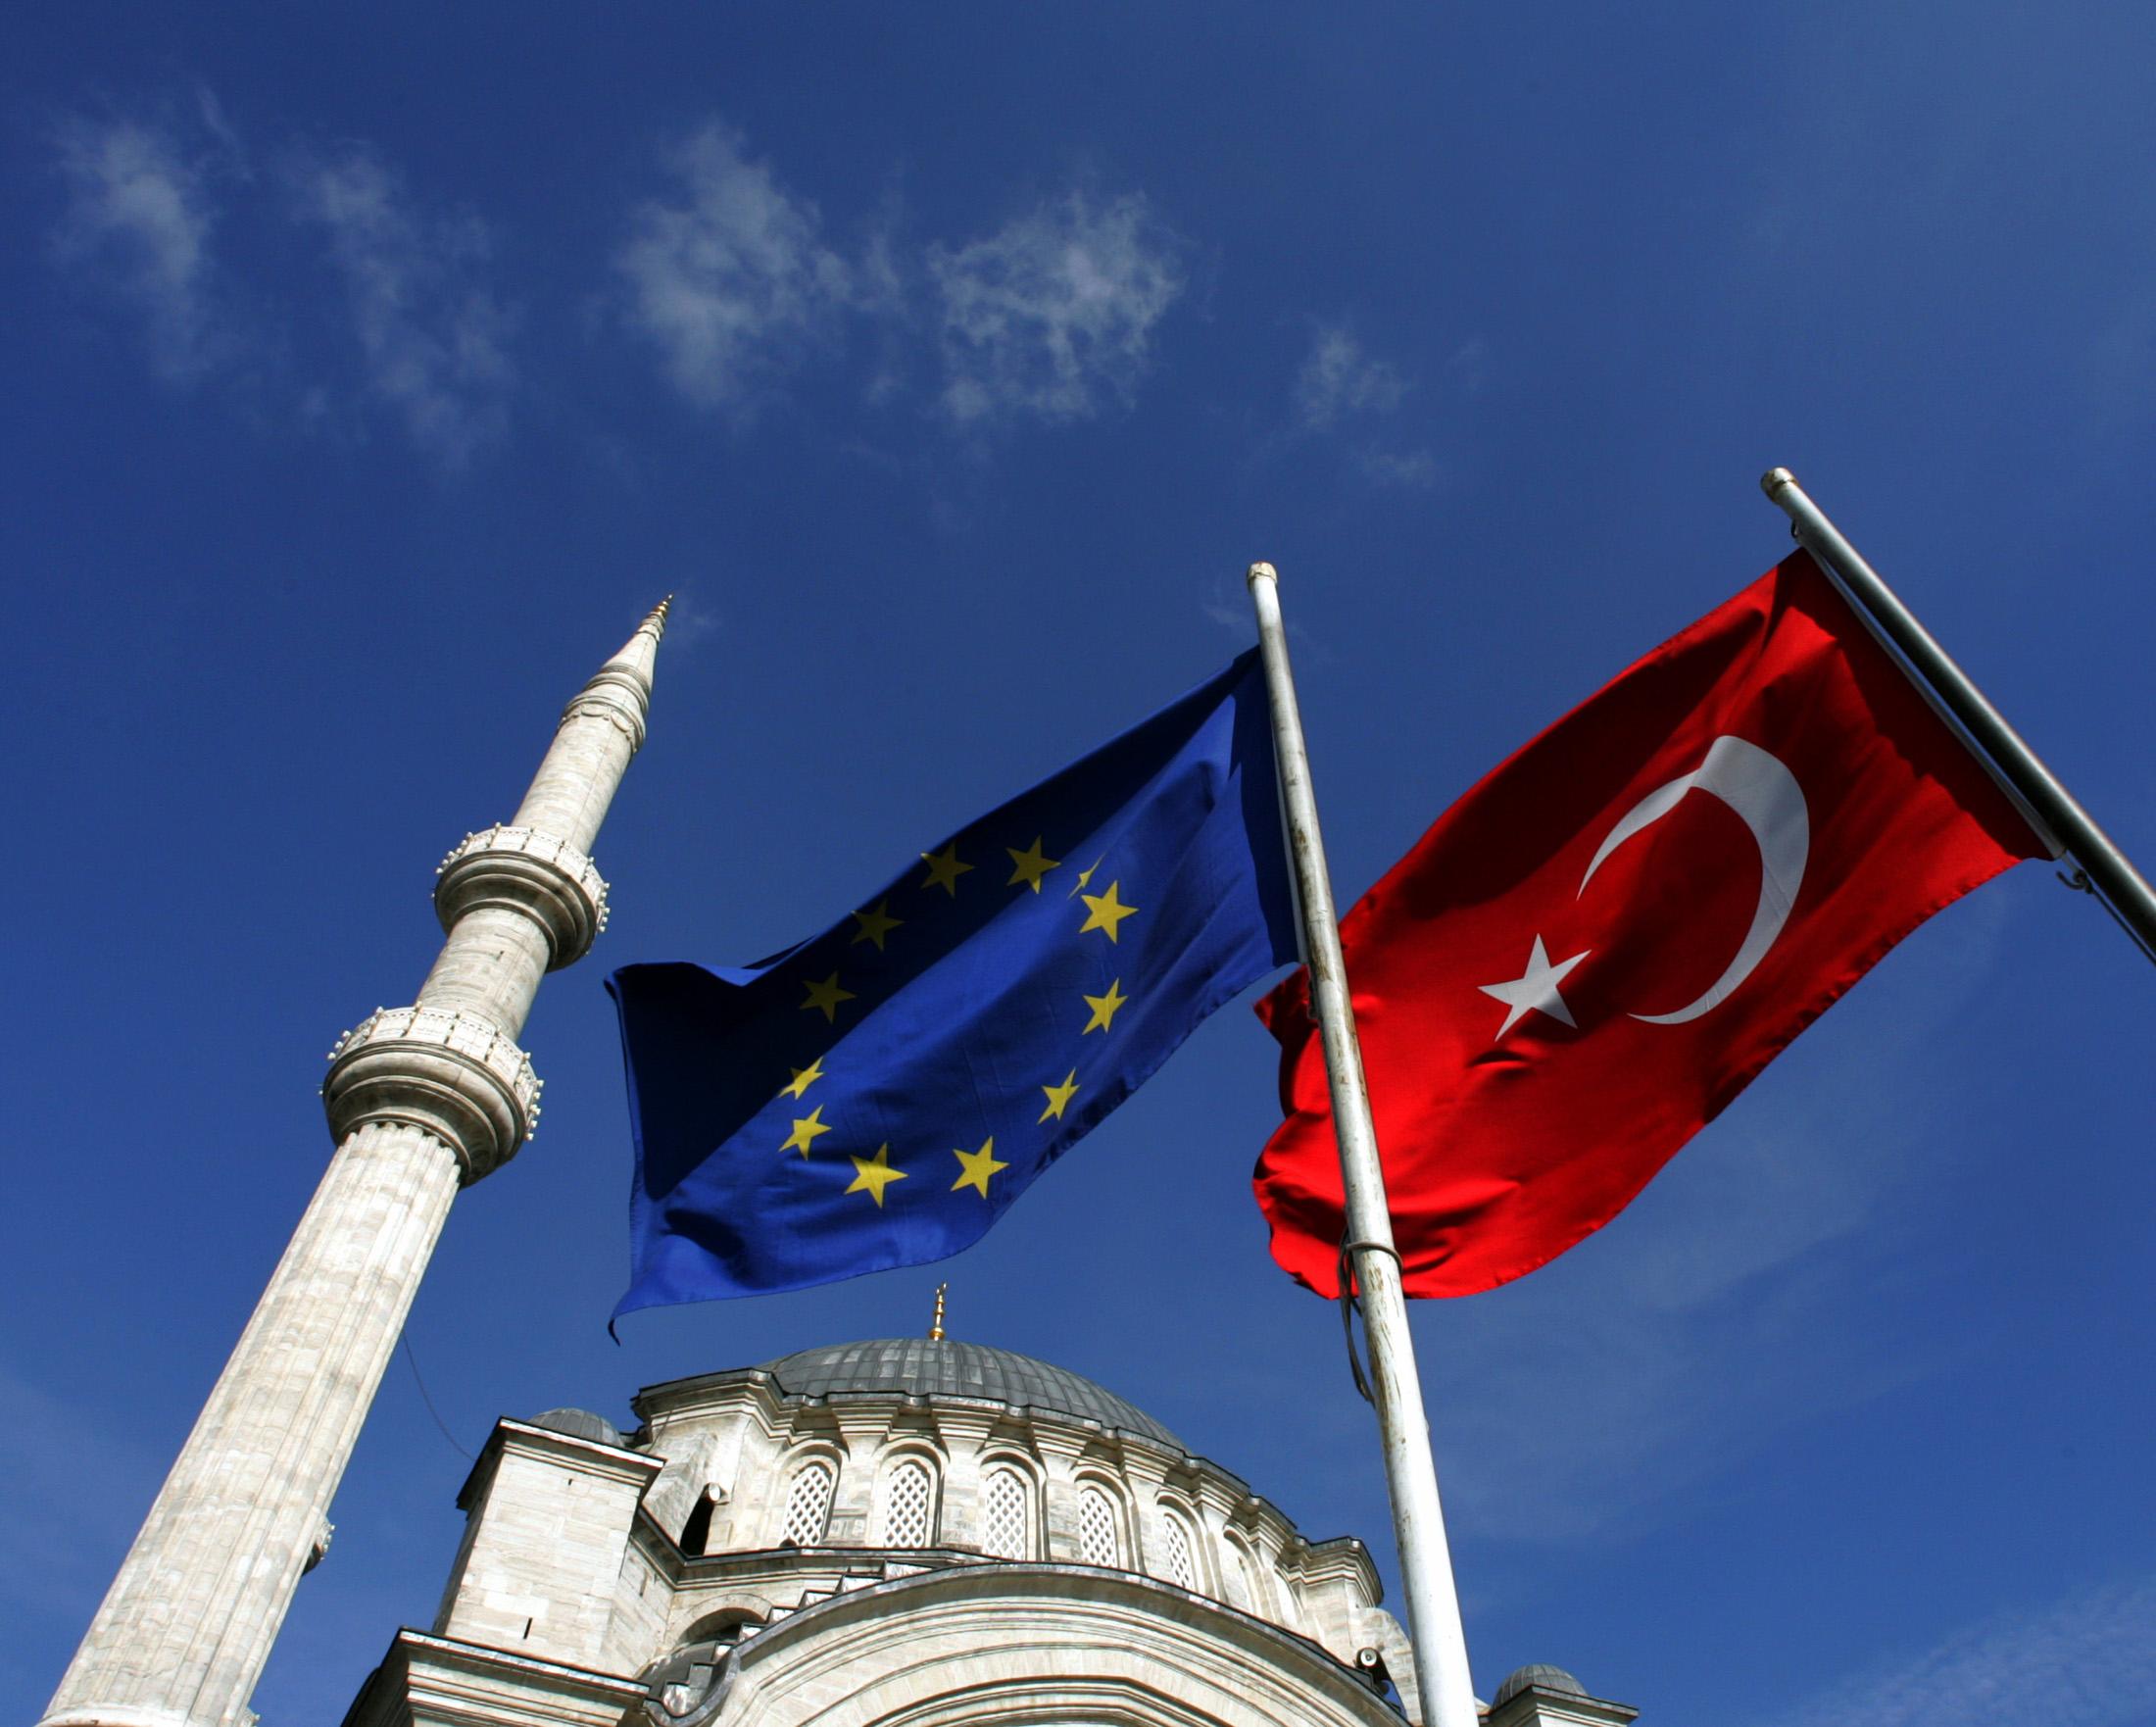 turkey and the eu Turkey poj cle iura1epo 2o3ao 4 5auroey 3o cle 2okoa6o 2 turkey and the eu: towards an uncertain future t he prospect of full membership was embedded.